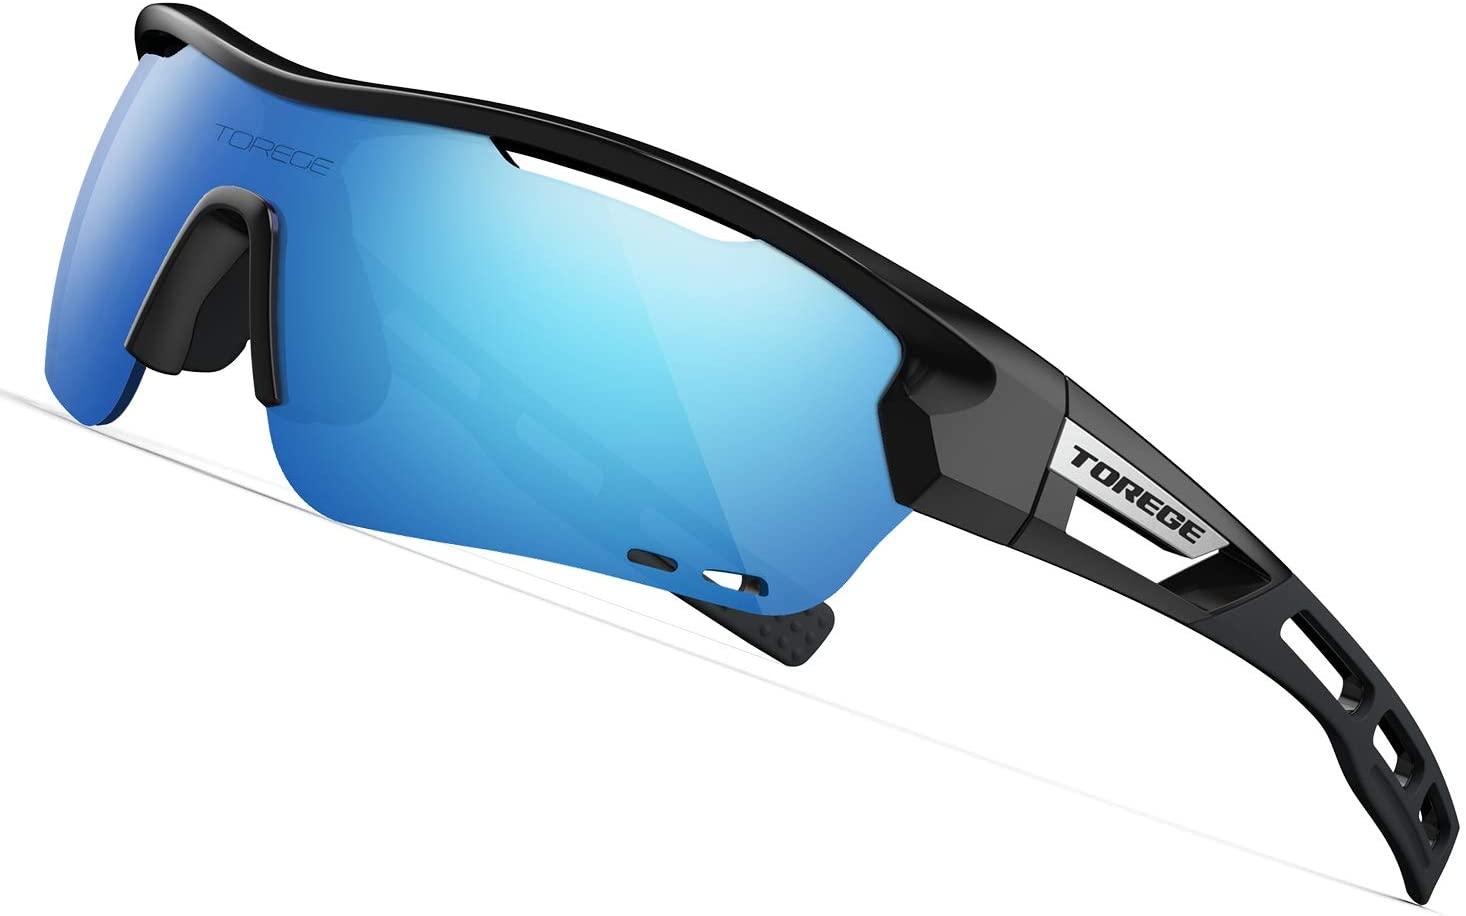 Torege polarized sunglasses